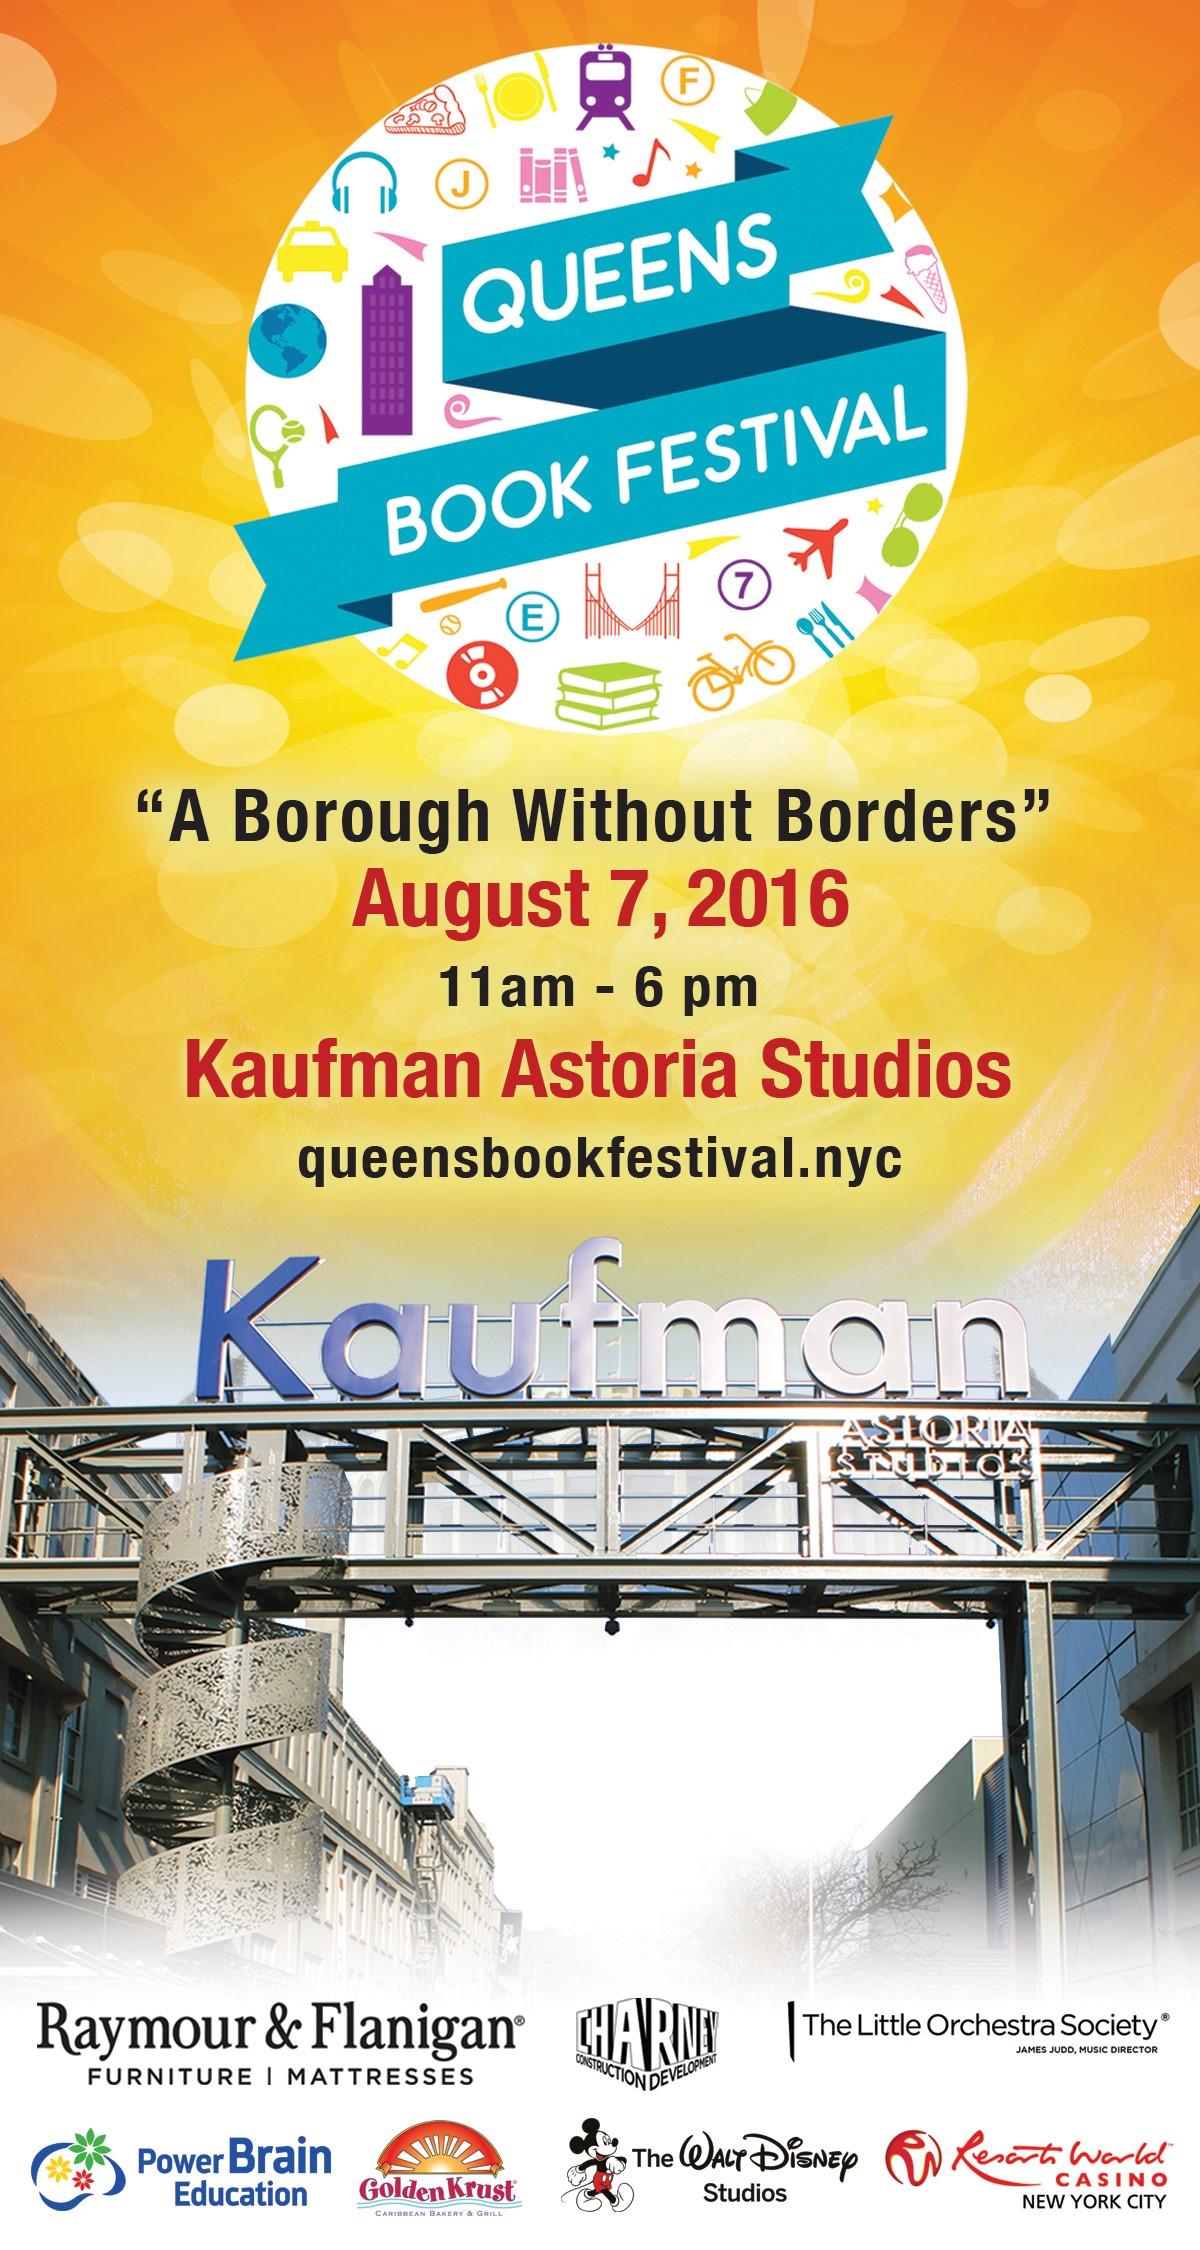 Queens Book Festival at Kaufman Astoria